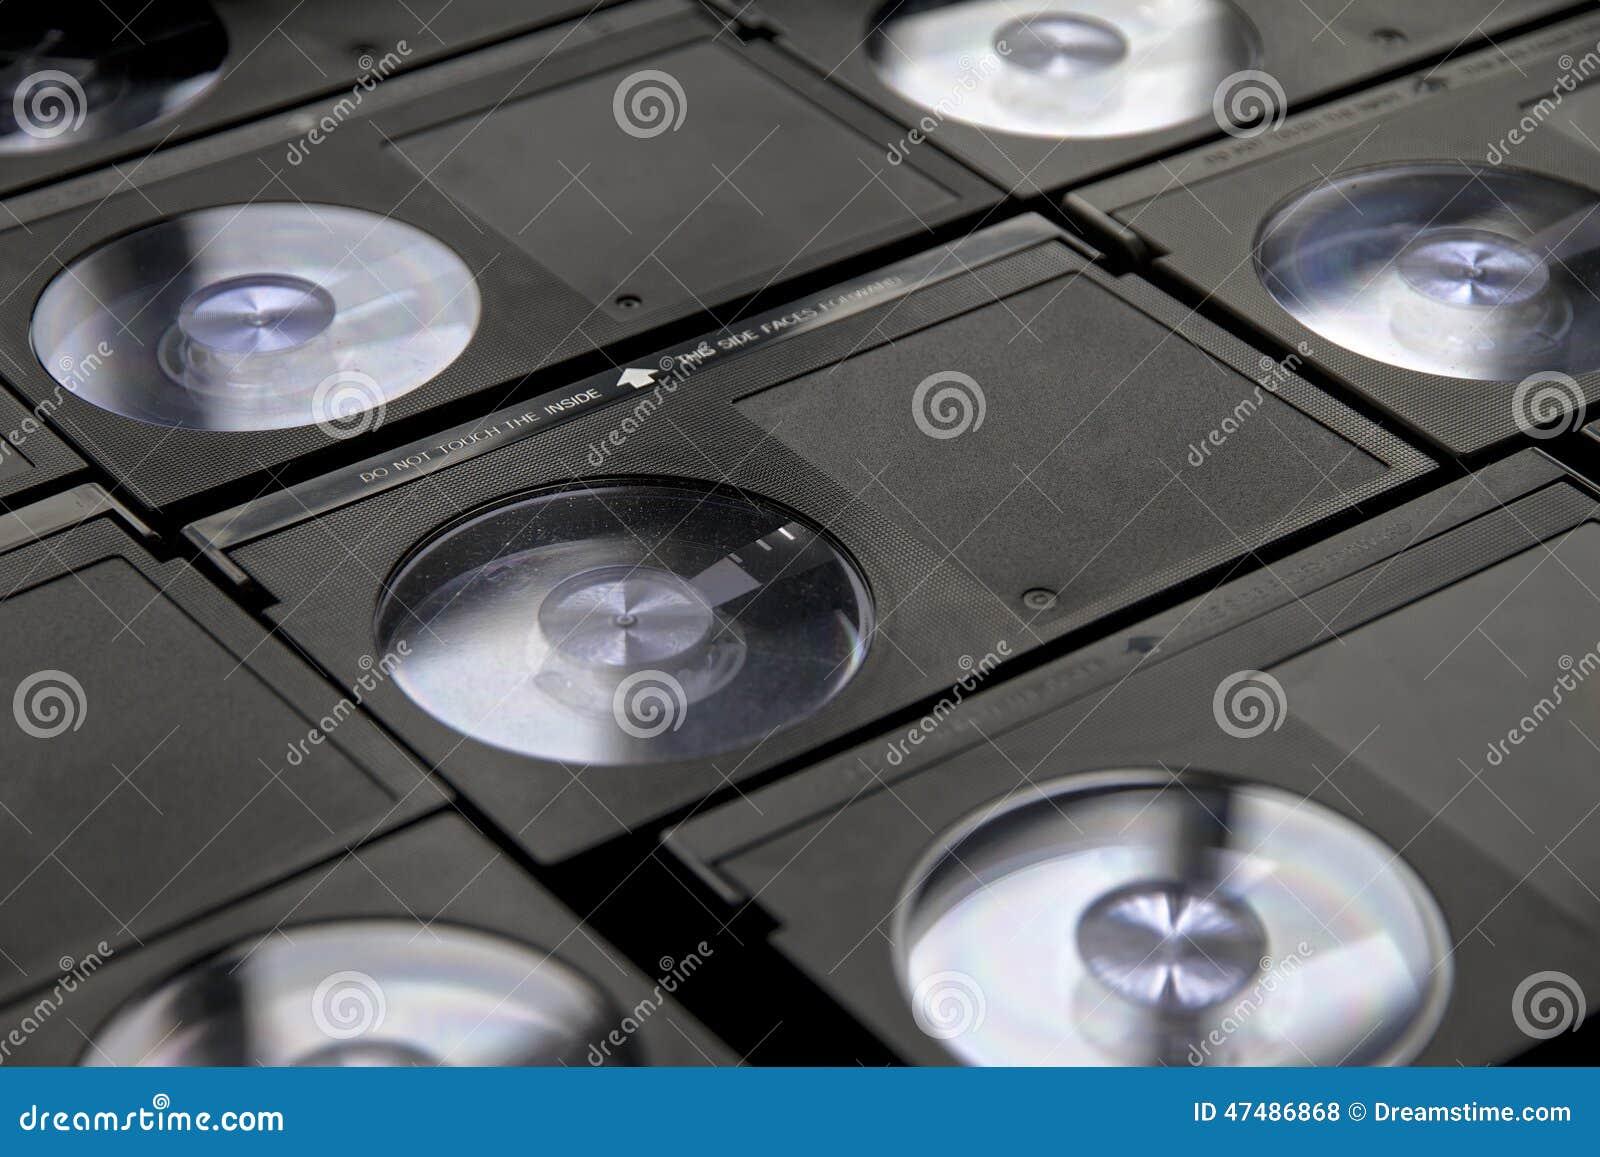 Betamax VCR tape cassettes